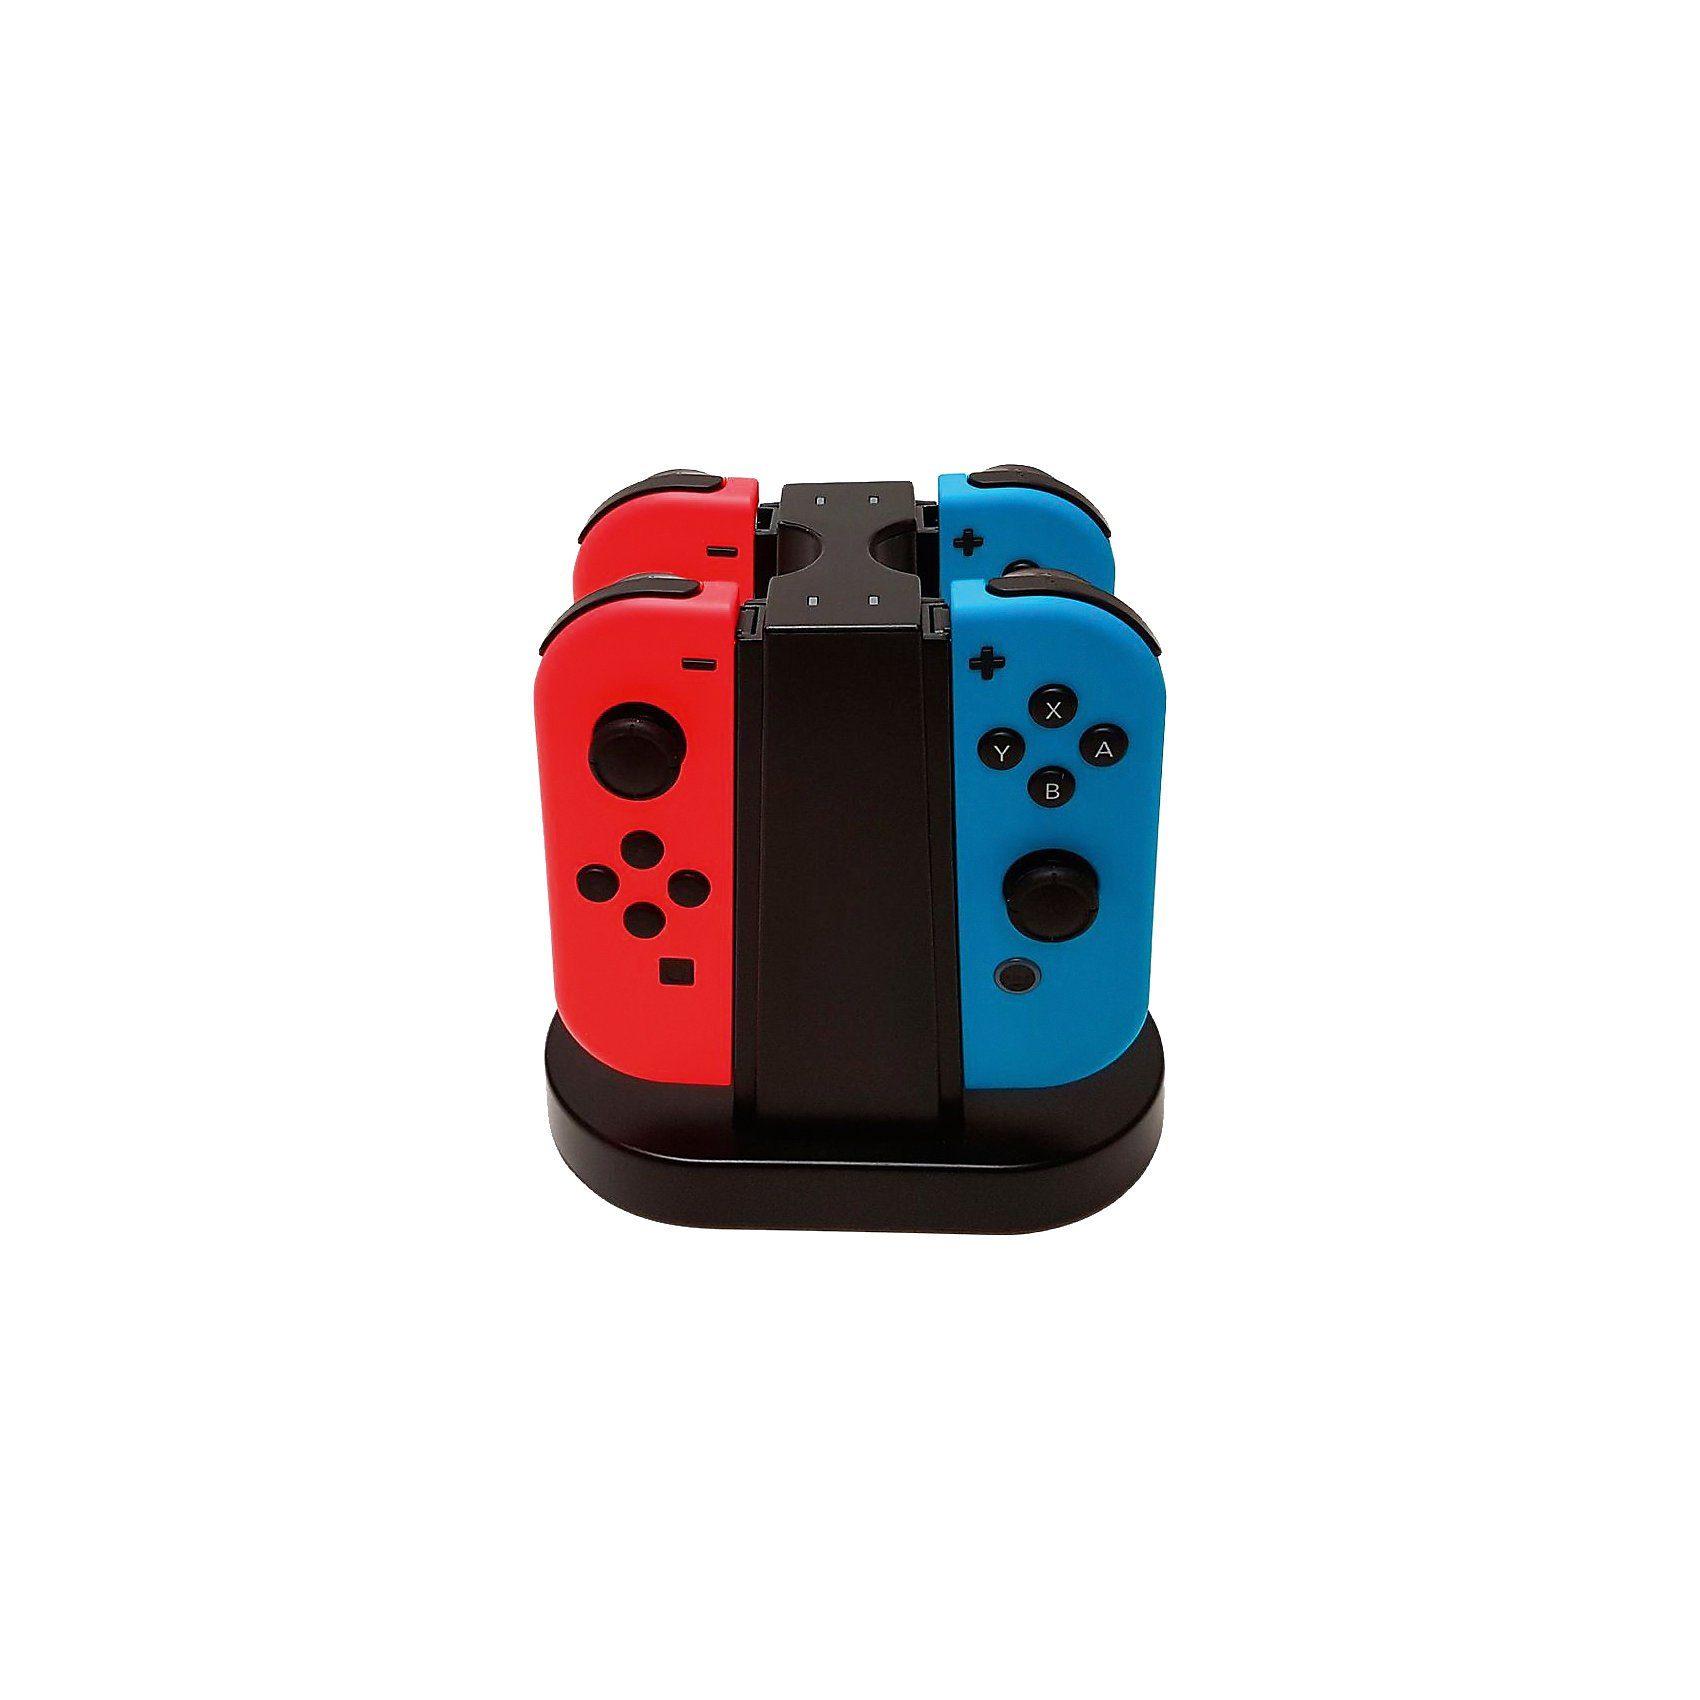 BigBen Nintendo Switch Quad Charging Station für Joy-Con